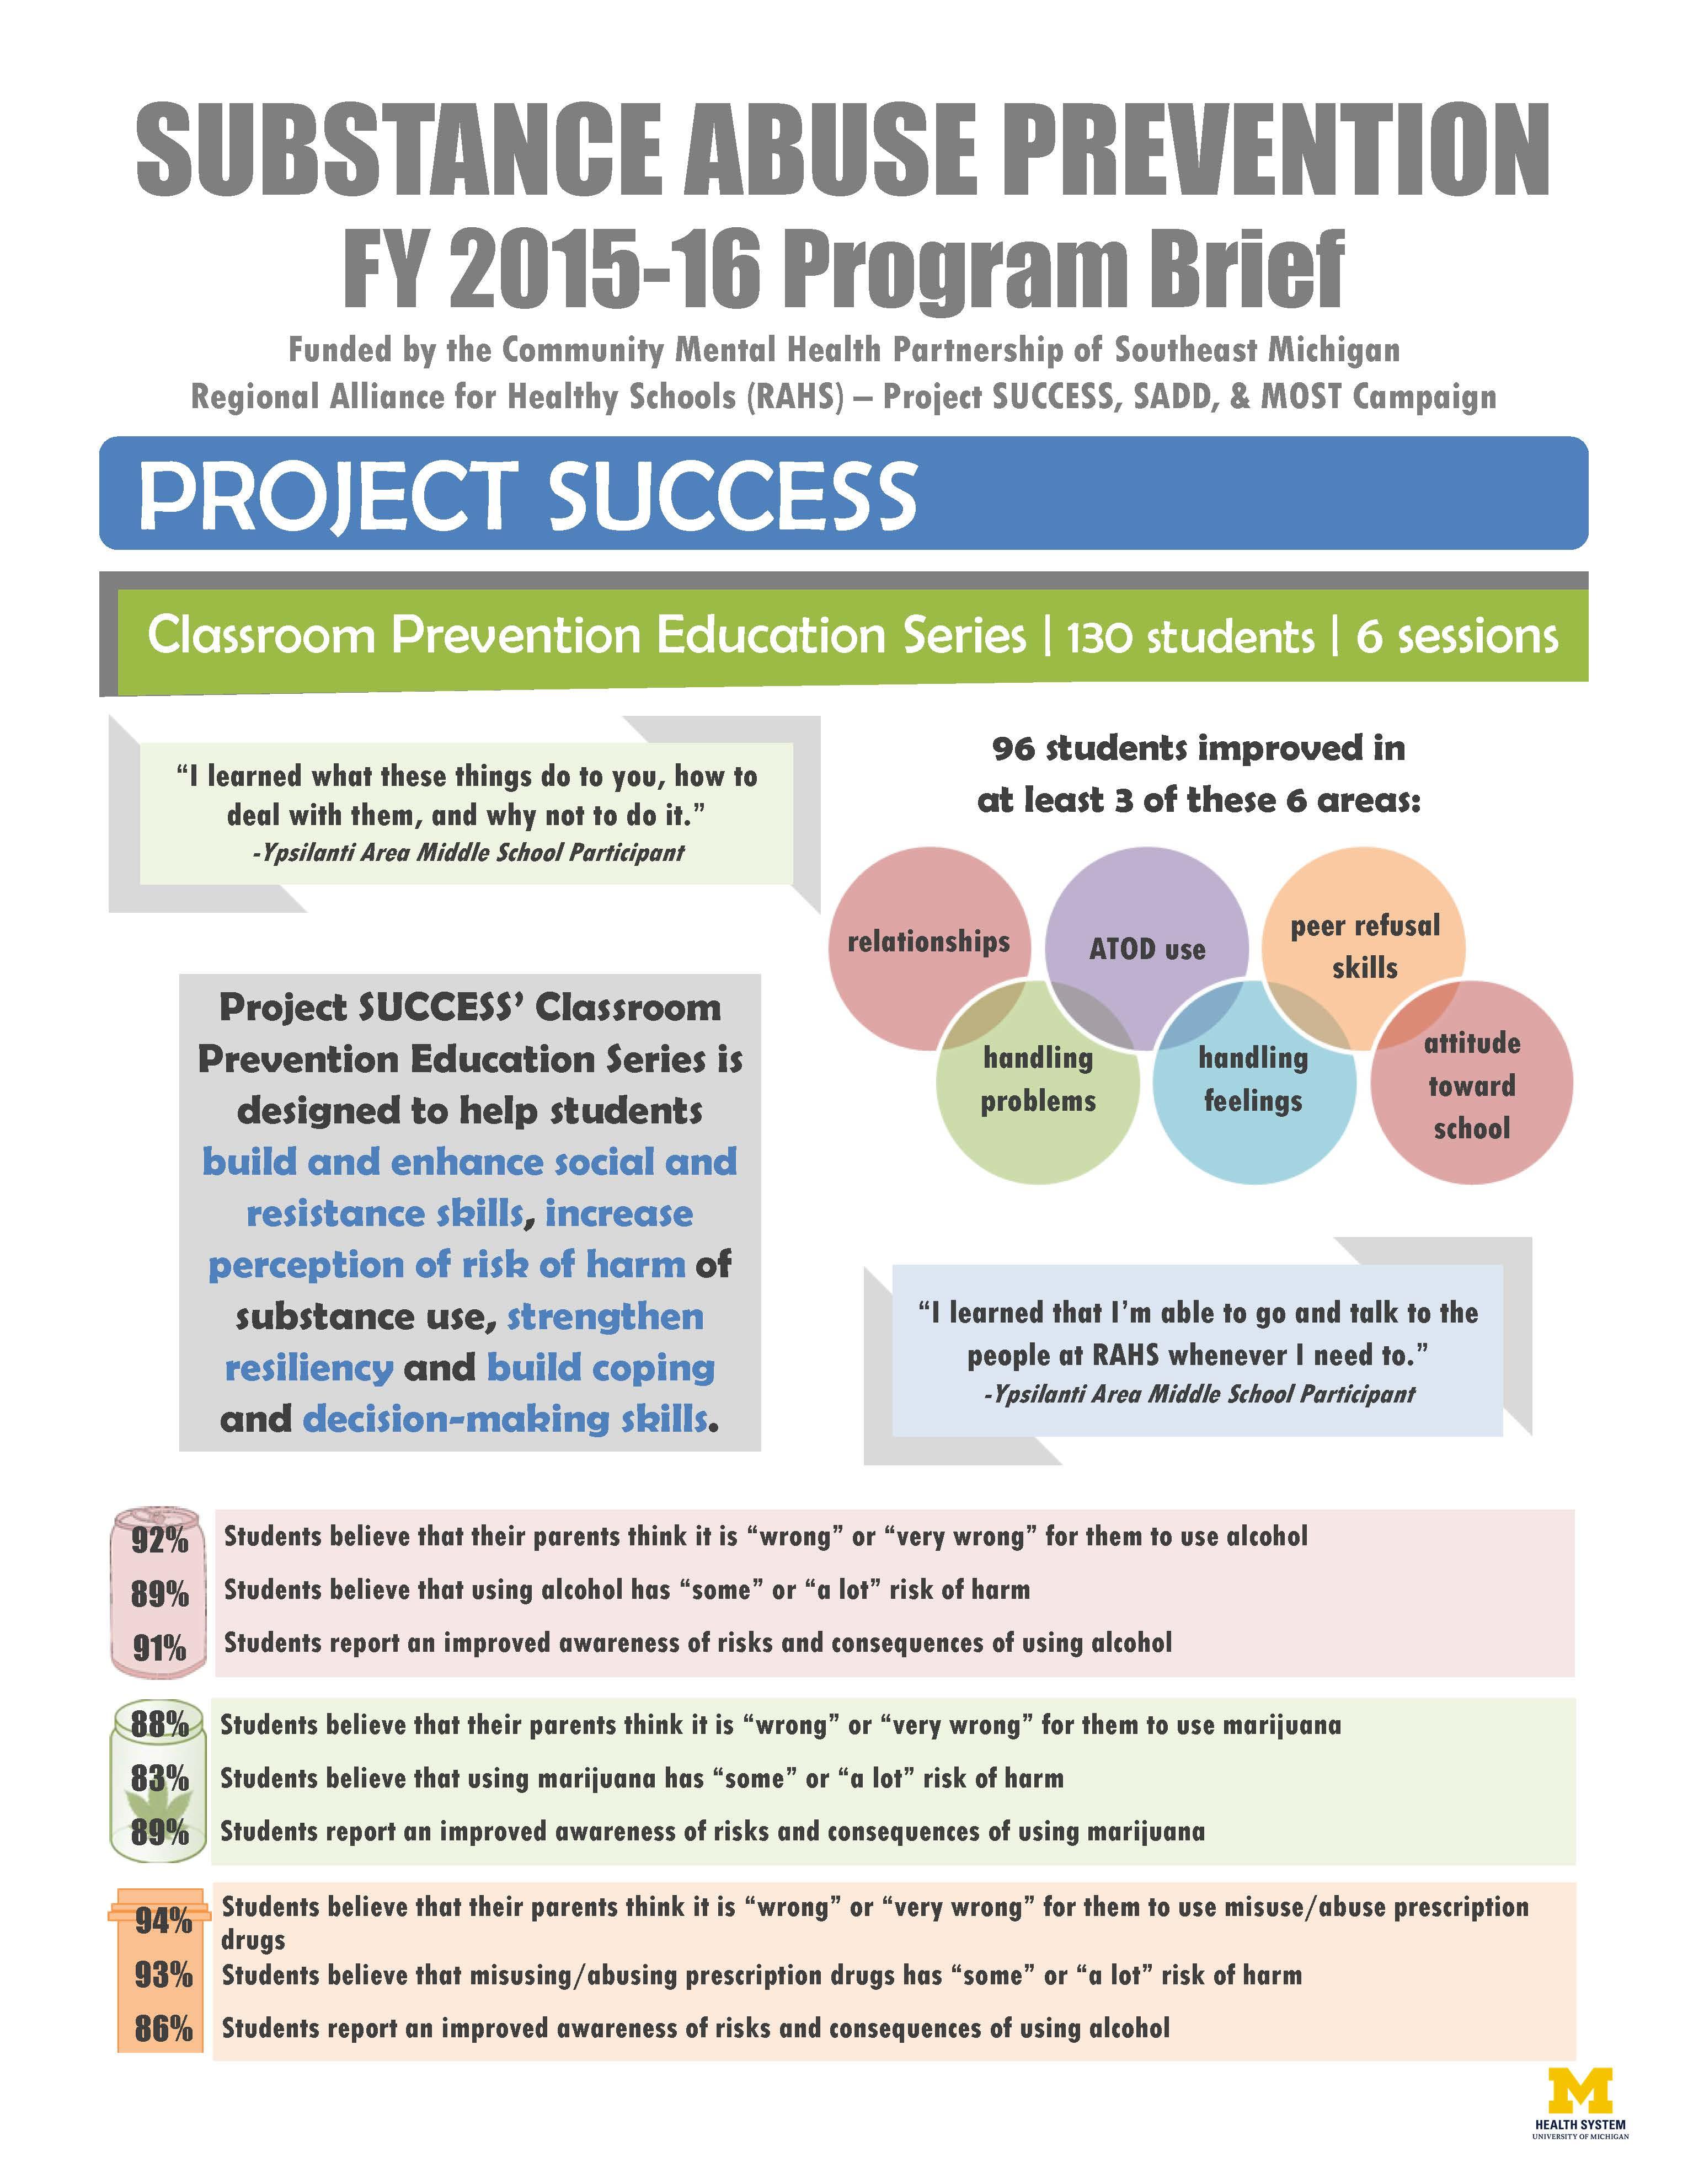 Project Success FY16 Program Brief page 1